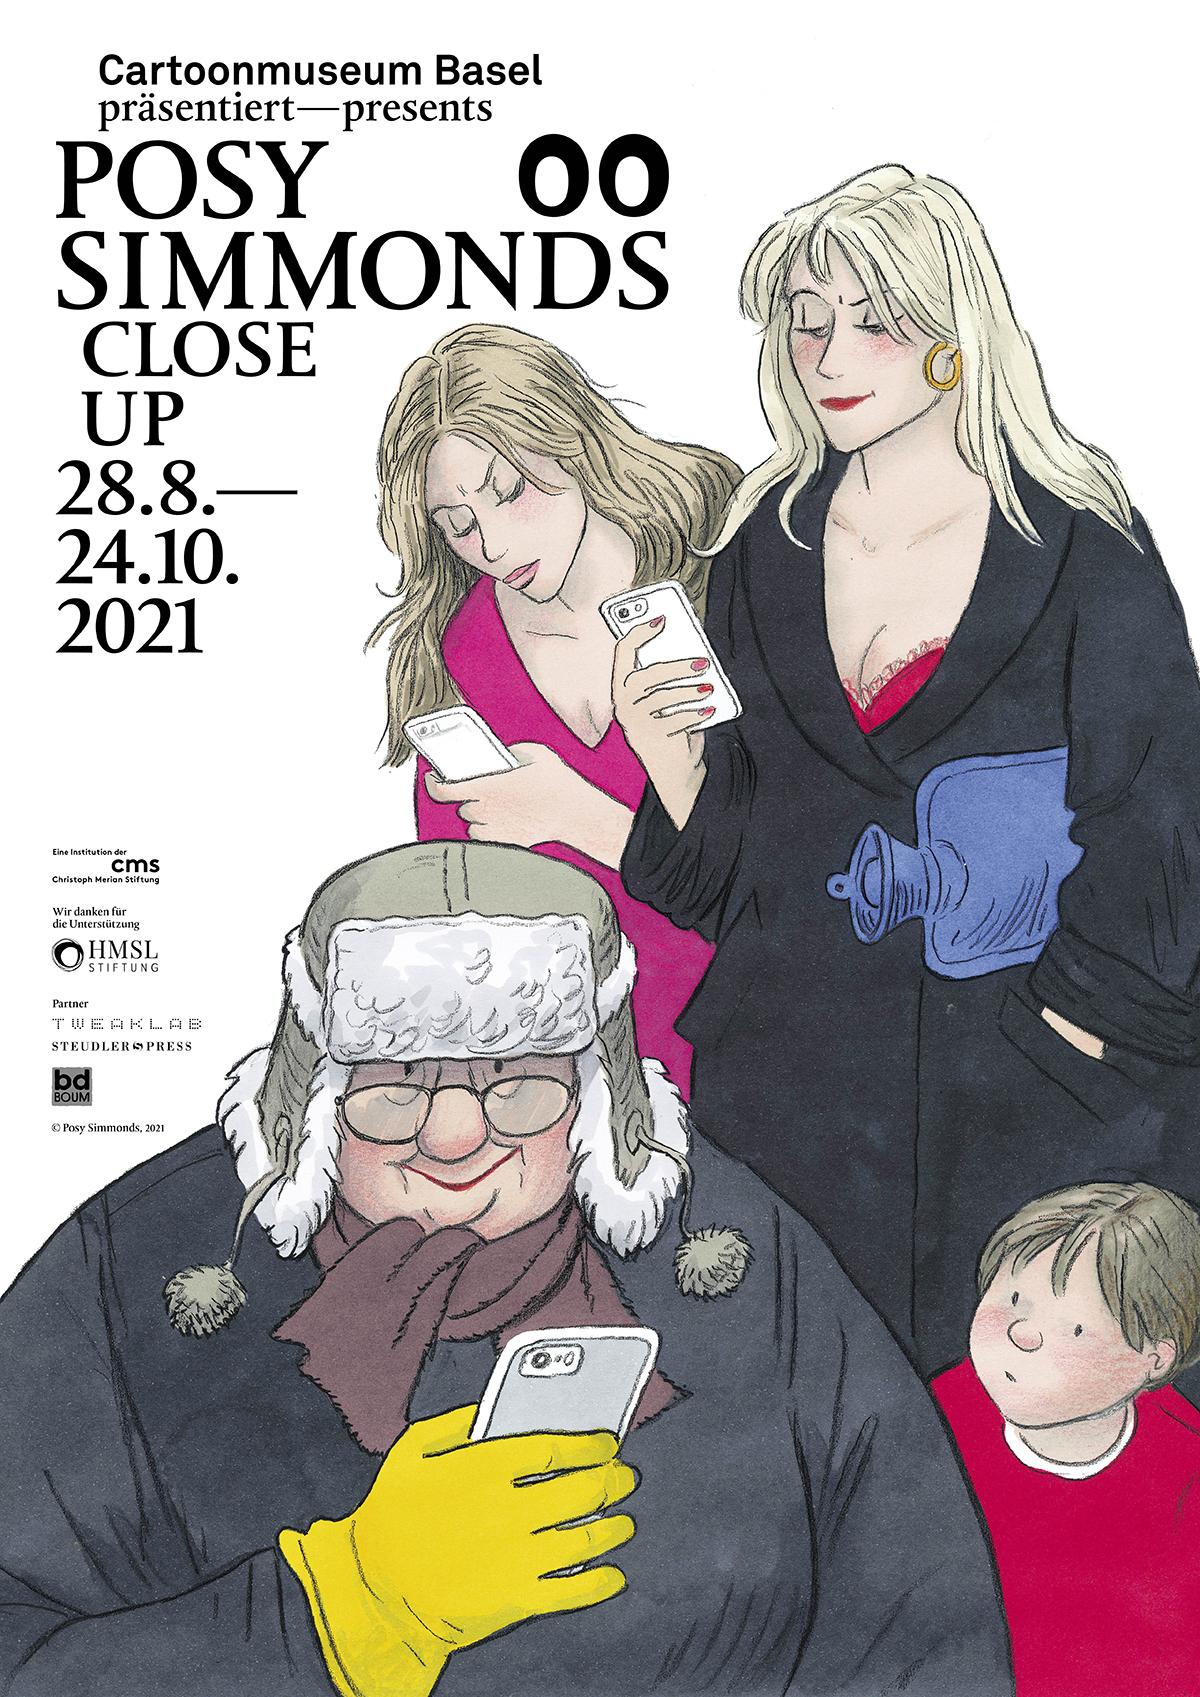 00 Ausstellungsplakat Posy Simmonds Close Up